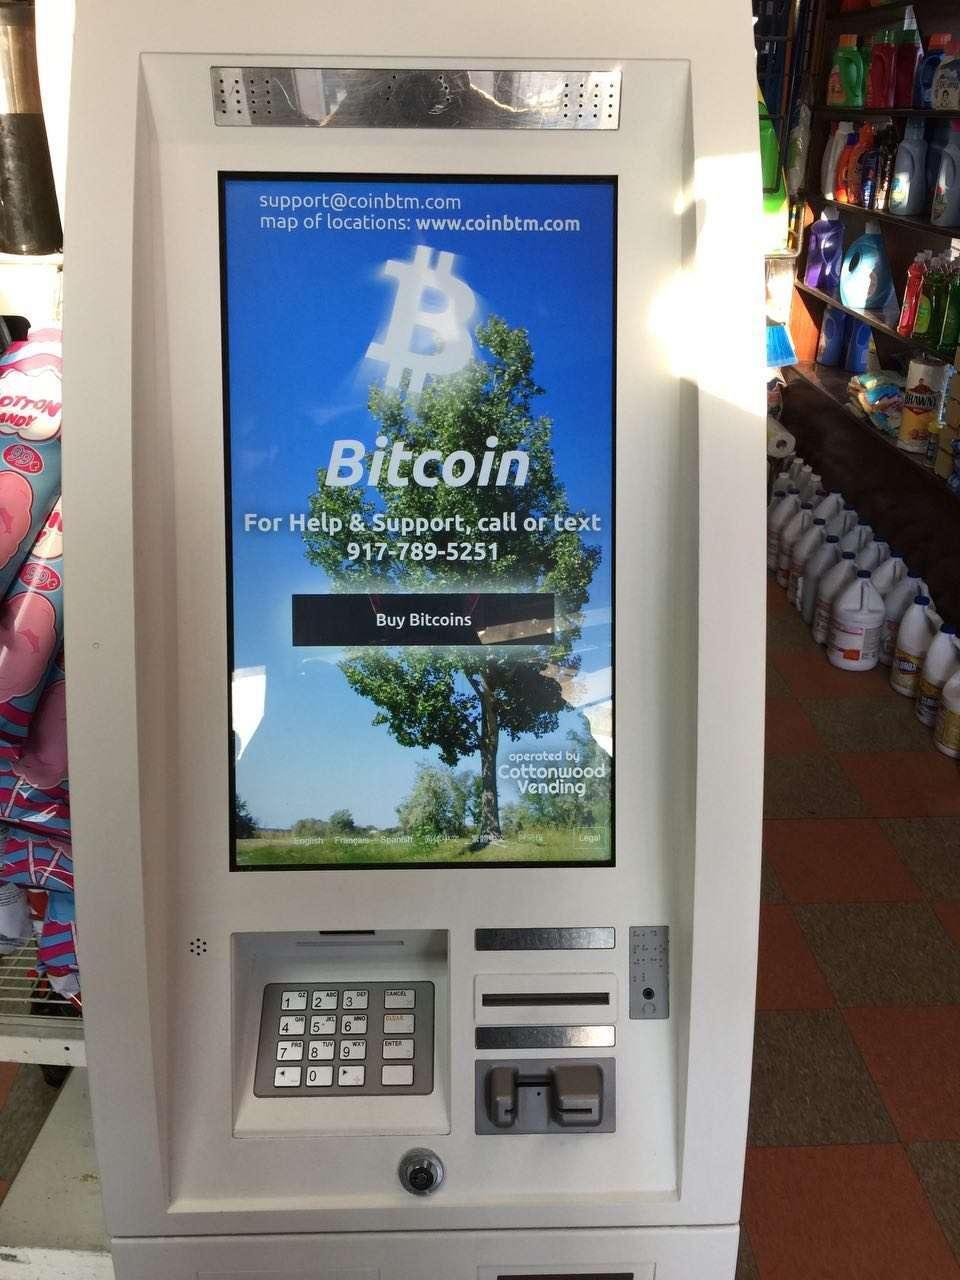 CoinBTM - Bitcoin ATM - atm  | Photo 6 of 7 | Address: 5401 Flatlands Ave, Brooklyn, NY 11234, USA | Phone: (917) 789-5251